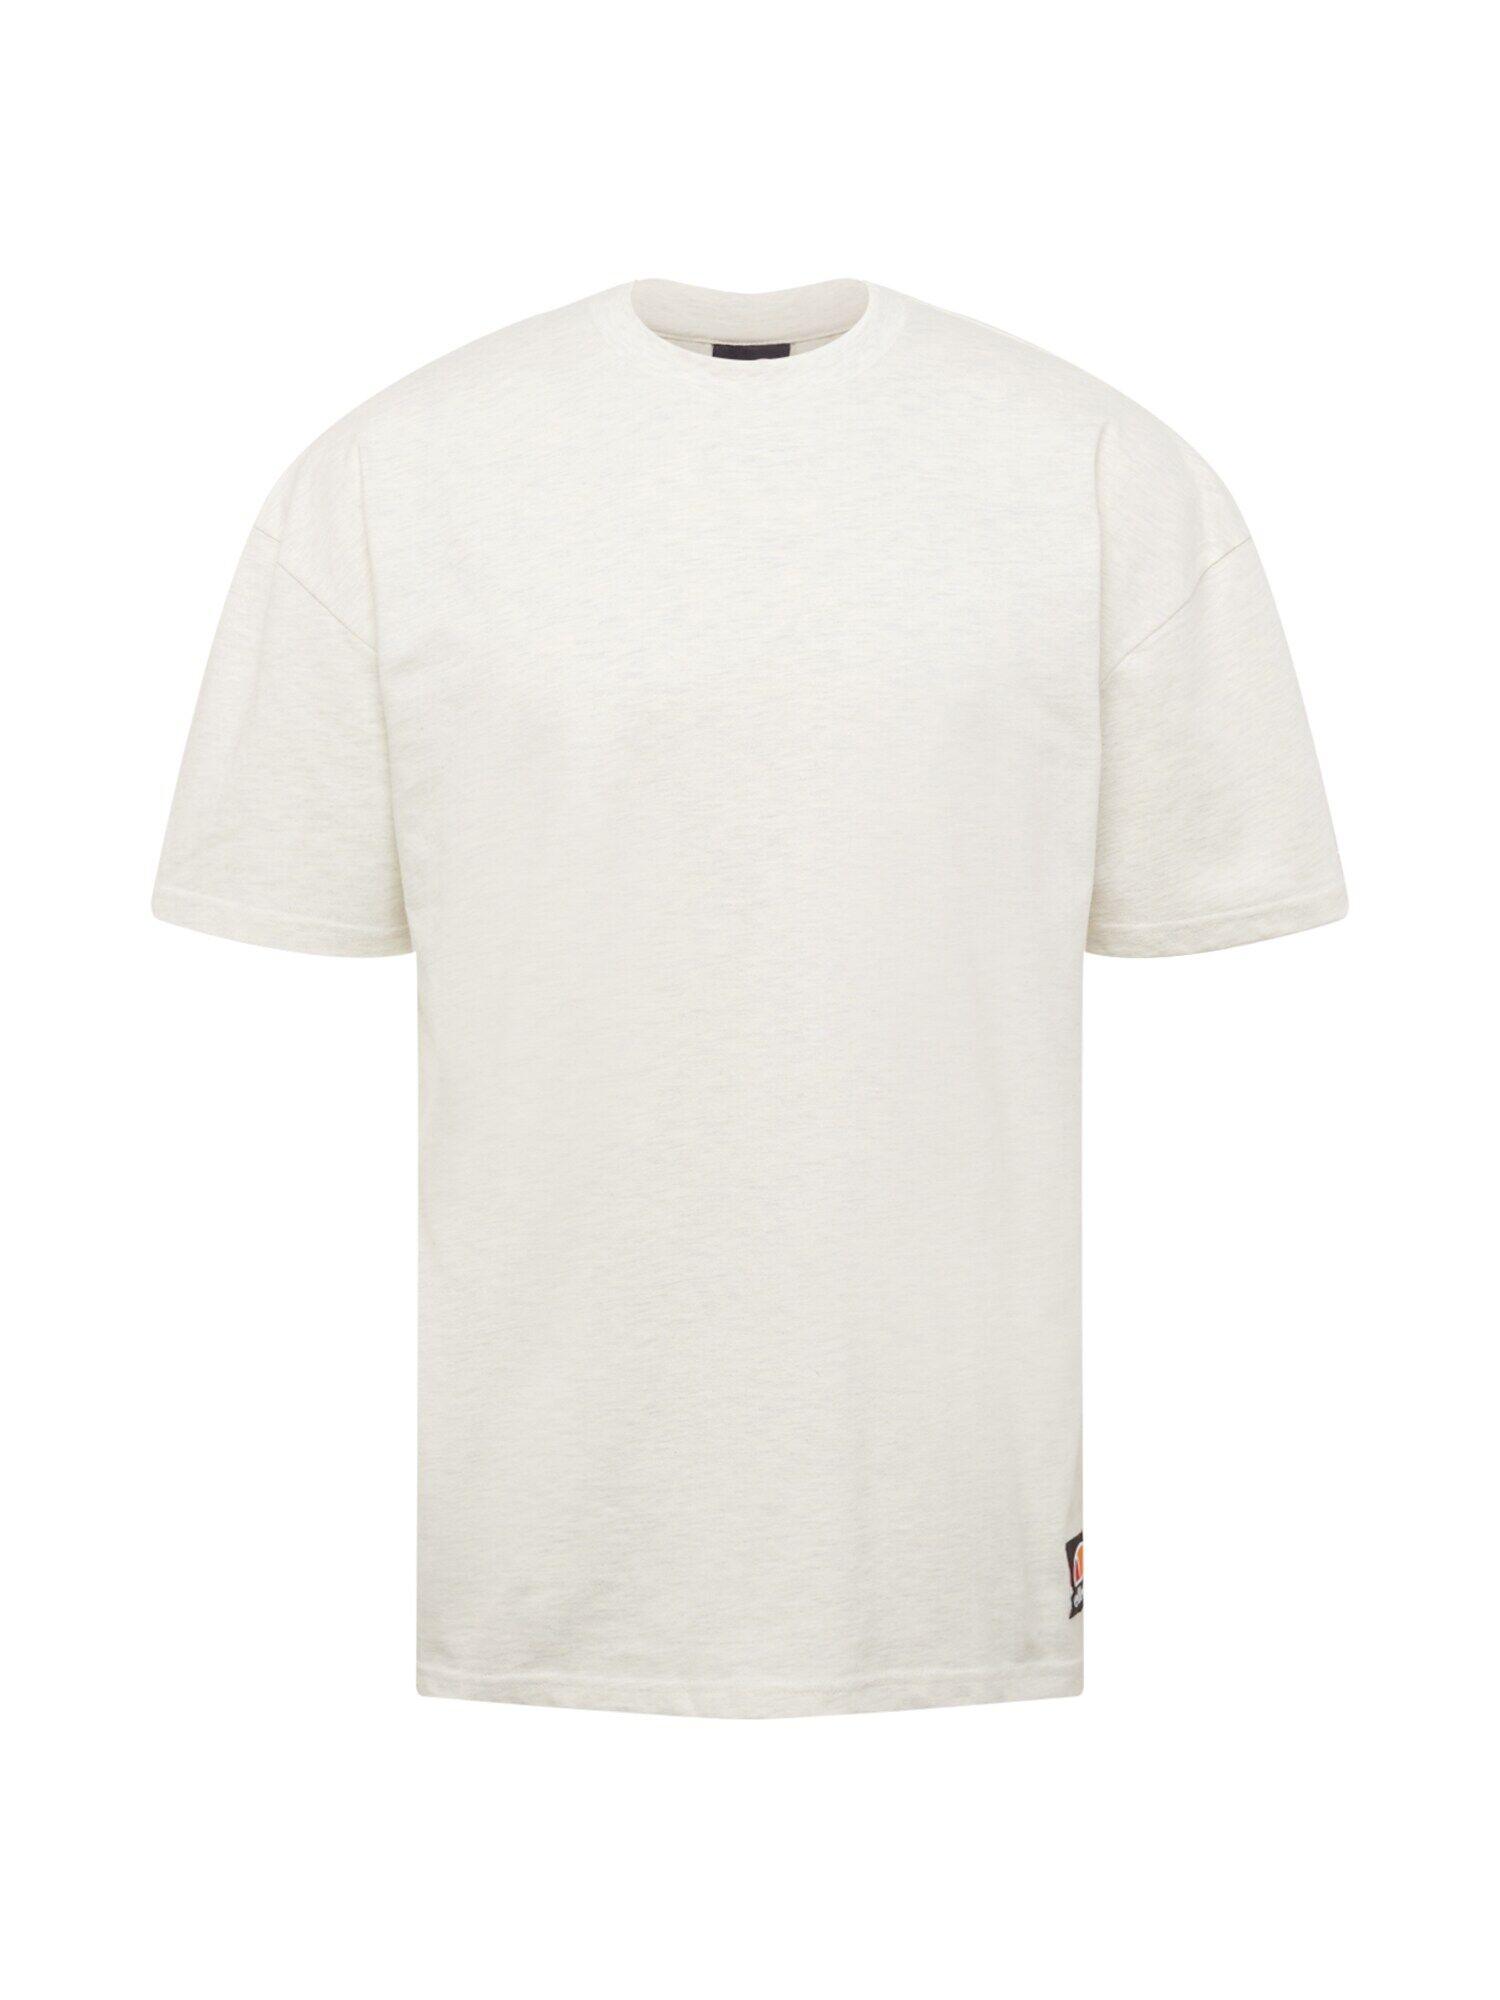 ELLESSE T-Shirt 'Avis'  - Blanc - Taille: XL - male